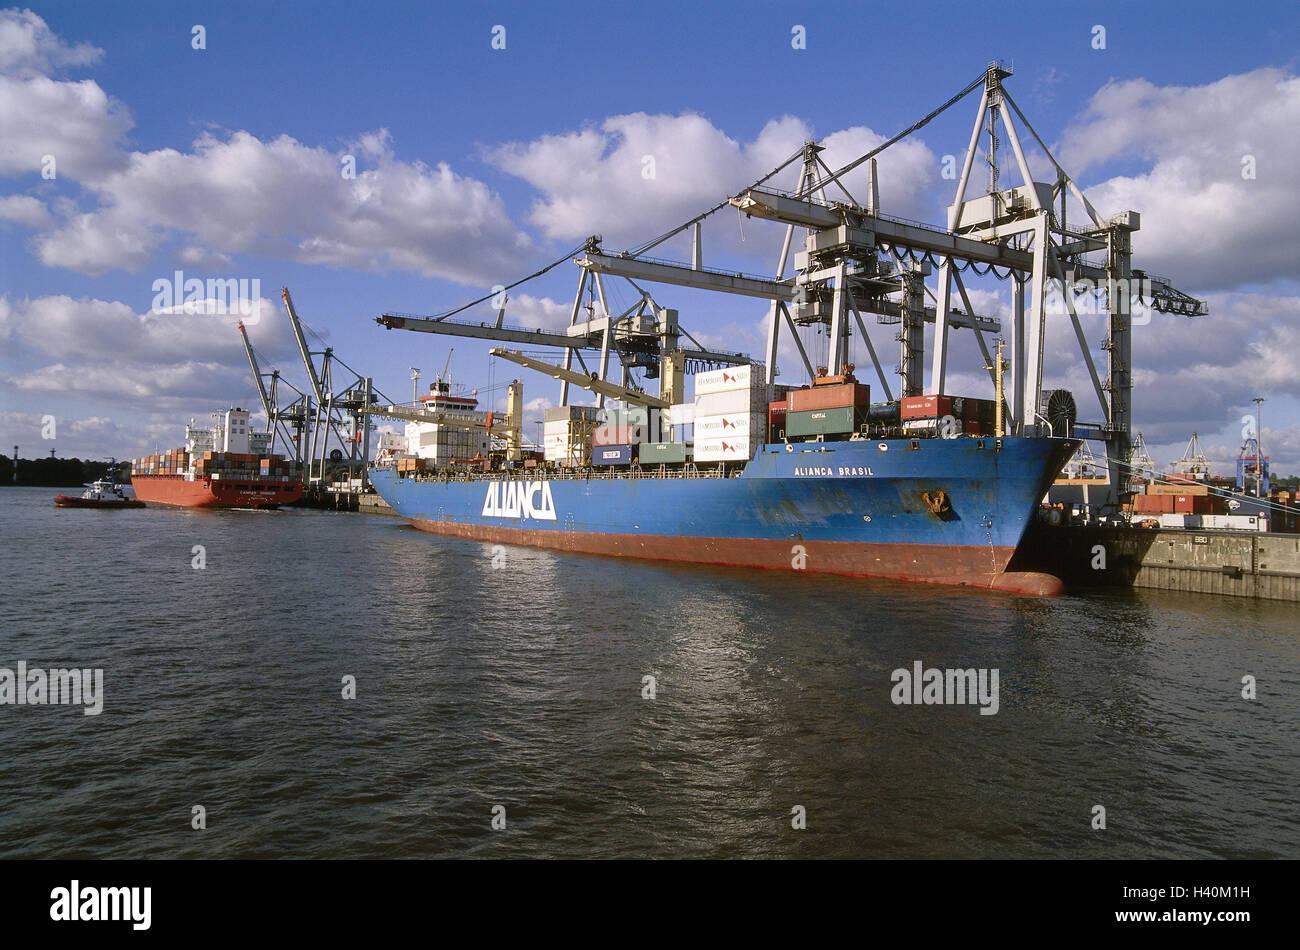 freighters stockfotos freighters bilder alamy. Black Bedroom Furniture Sets. Home Design Ideas